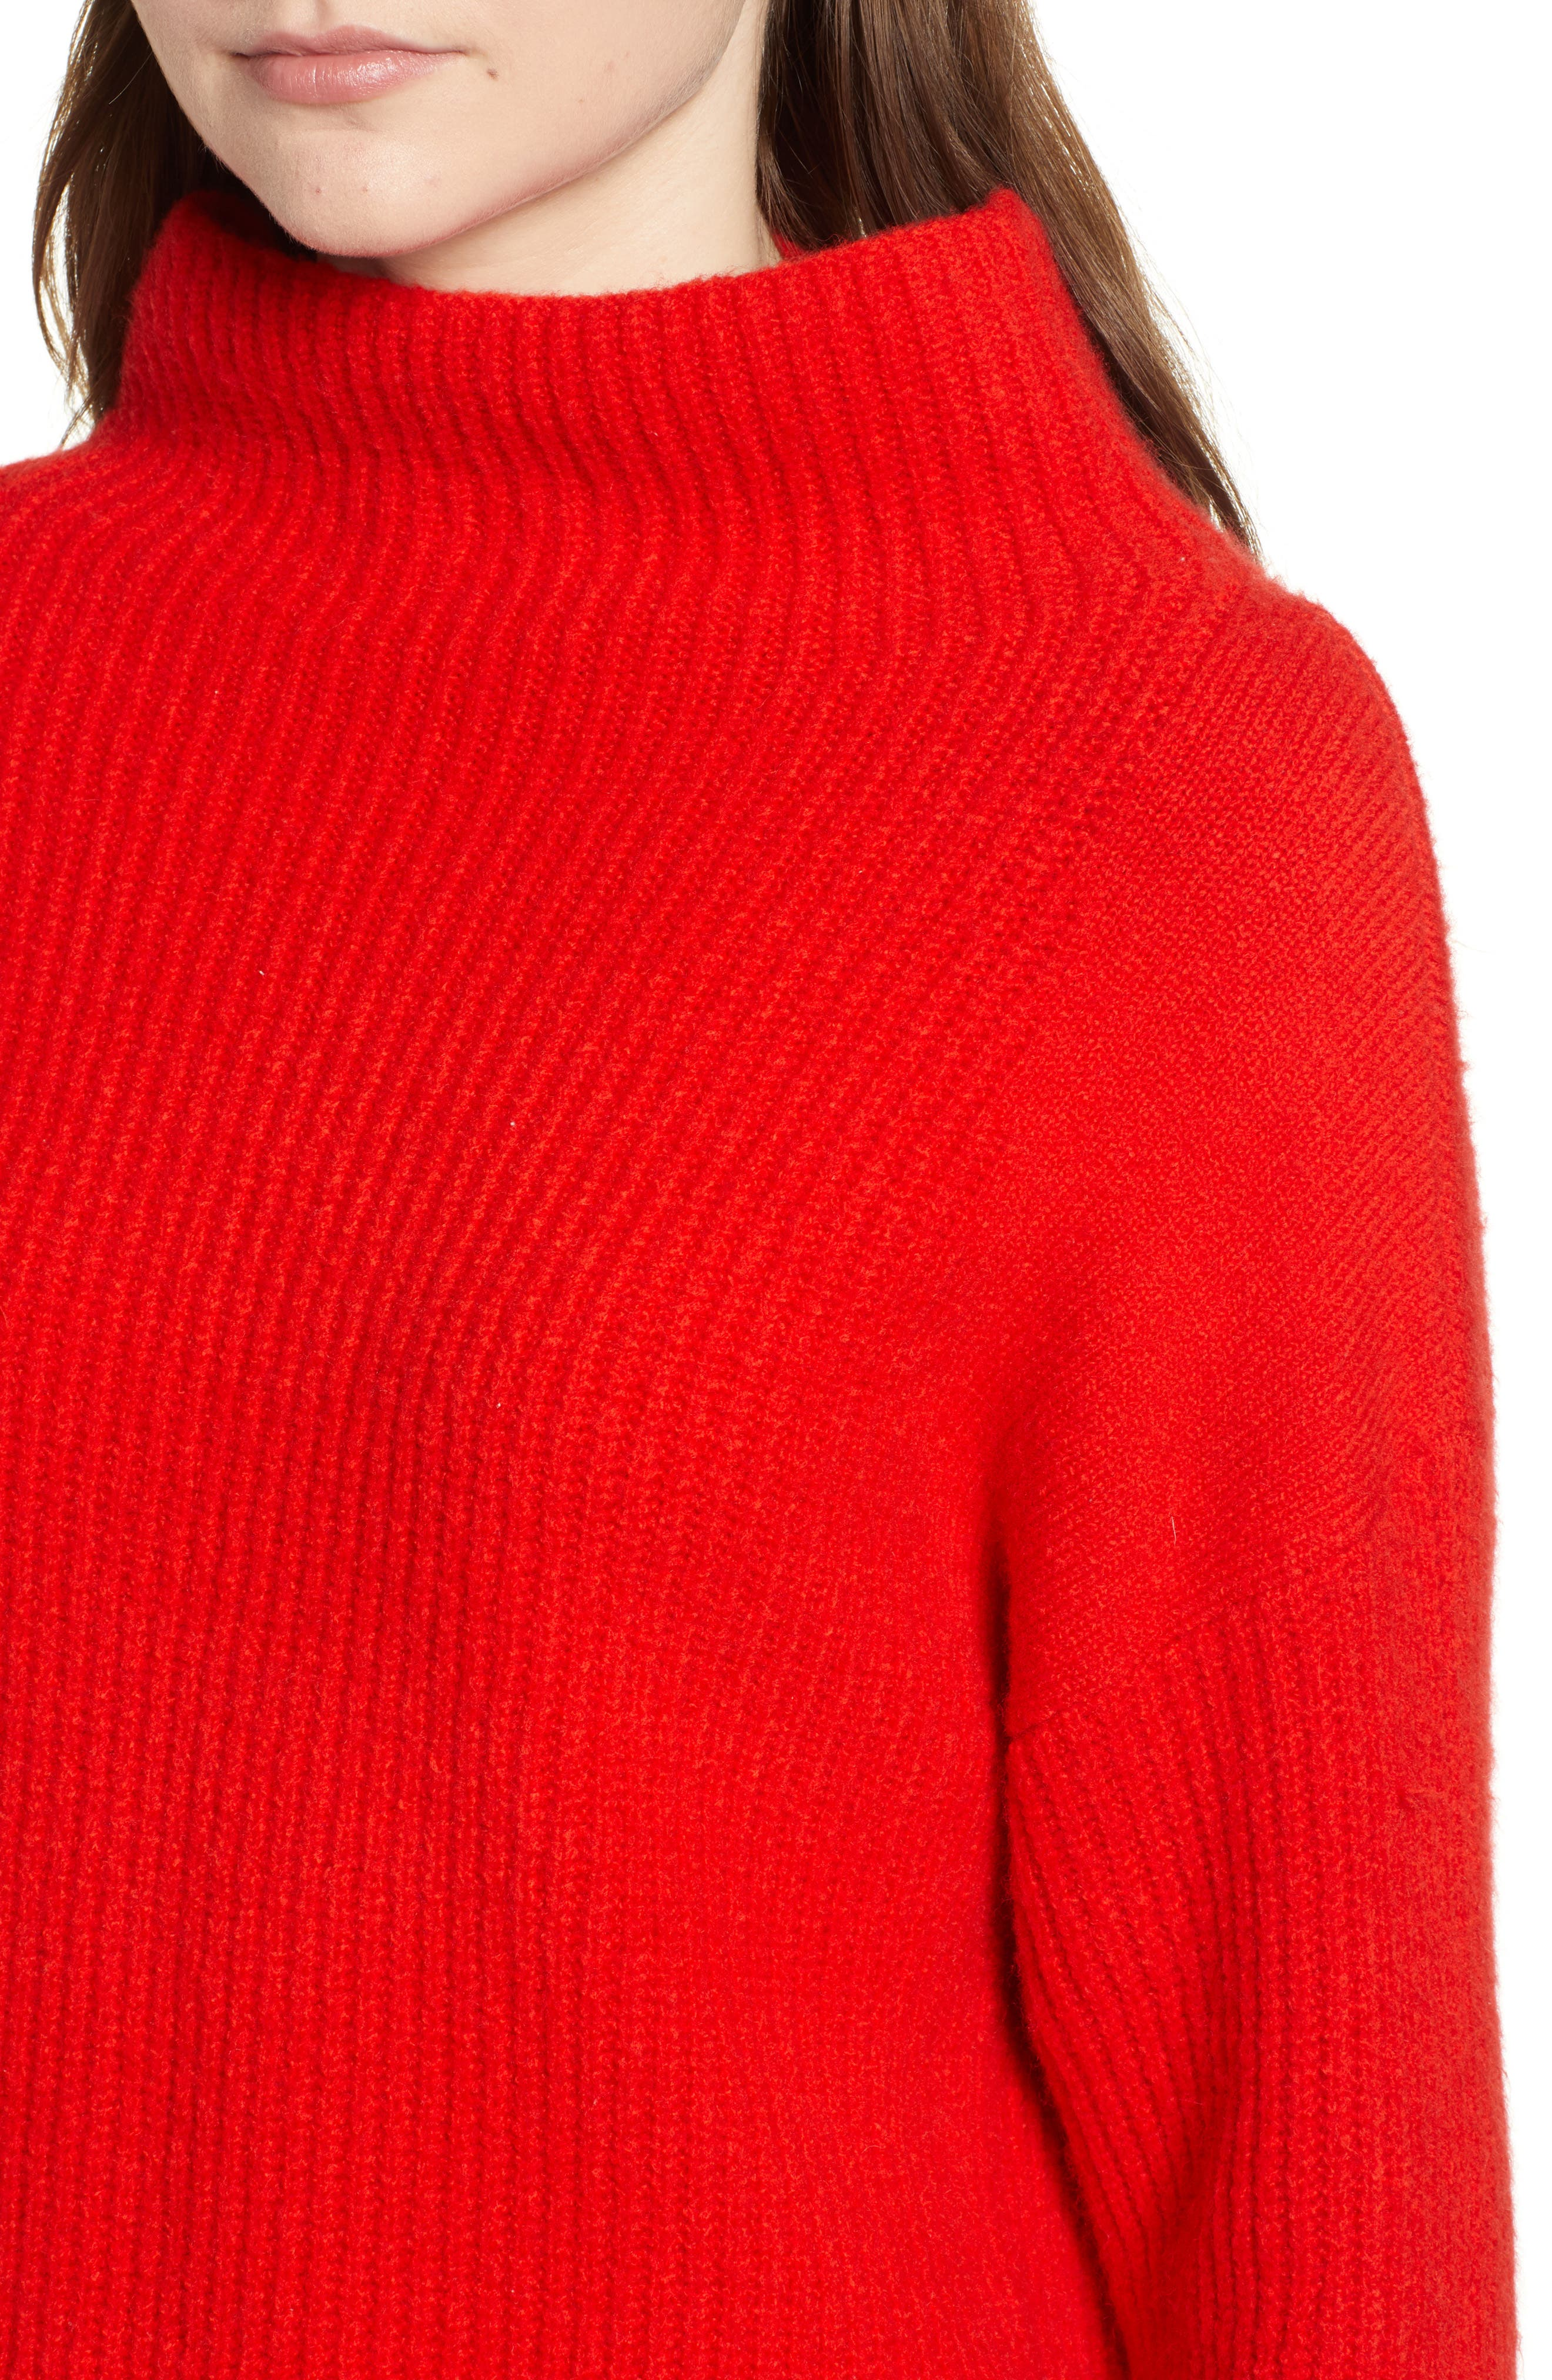 CHELSEA28,                             Rib Funnel Neck Sweater,                             Alternate thumbnail 5, color,                             610